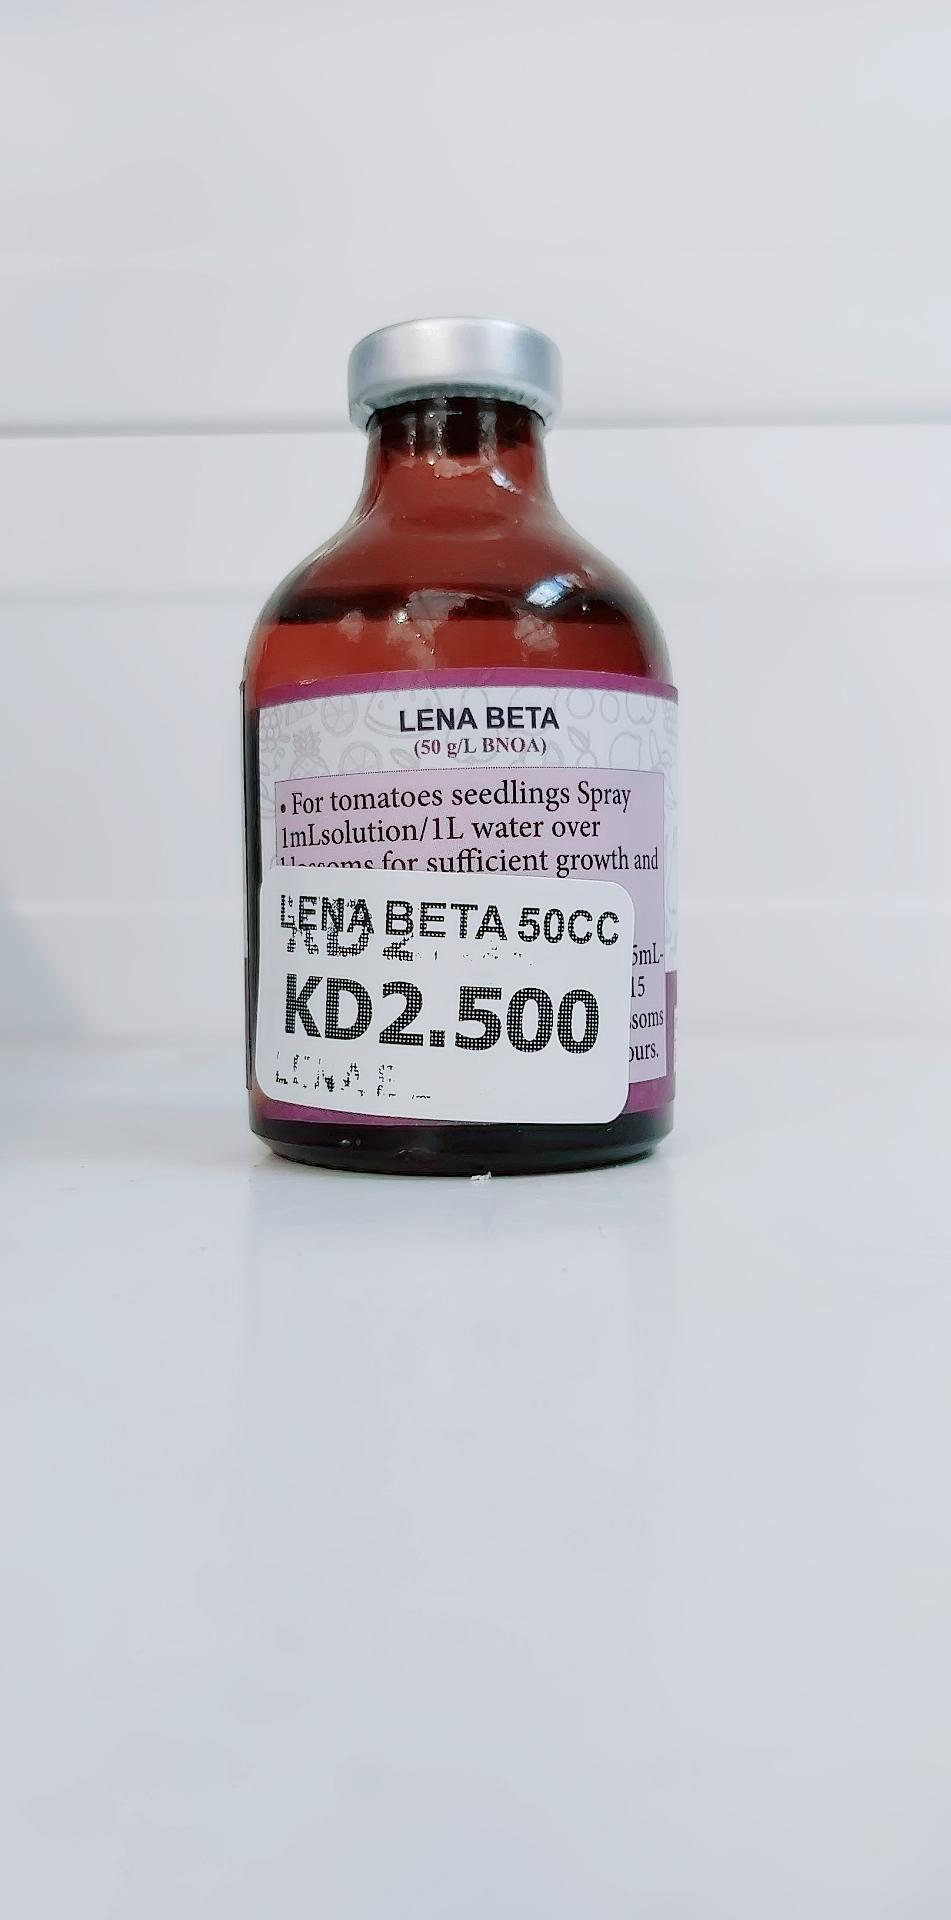 LENA BETA 50CC Online